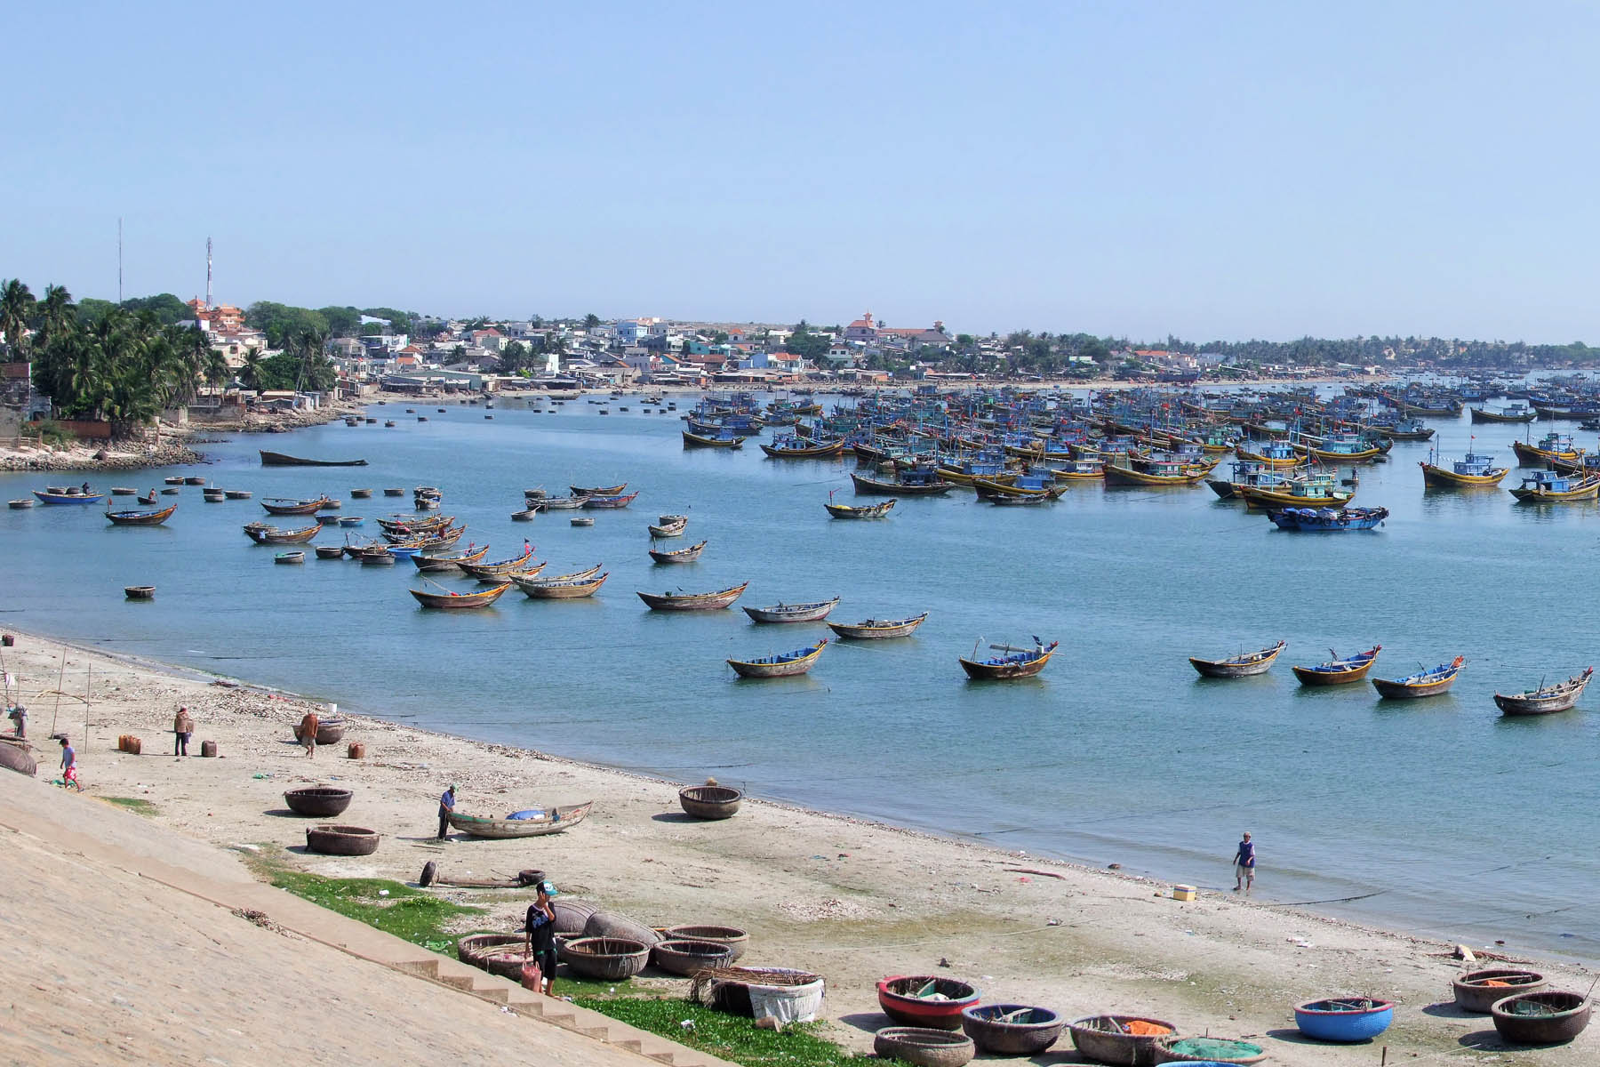 vue generale bateaux port mui ne vietnam